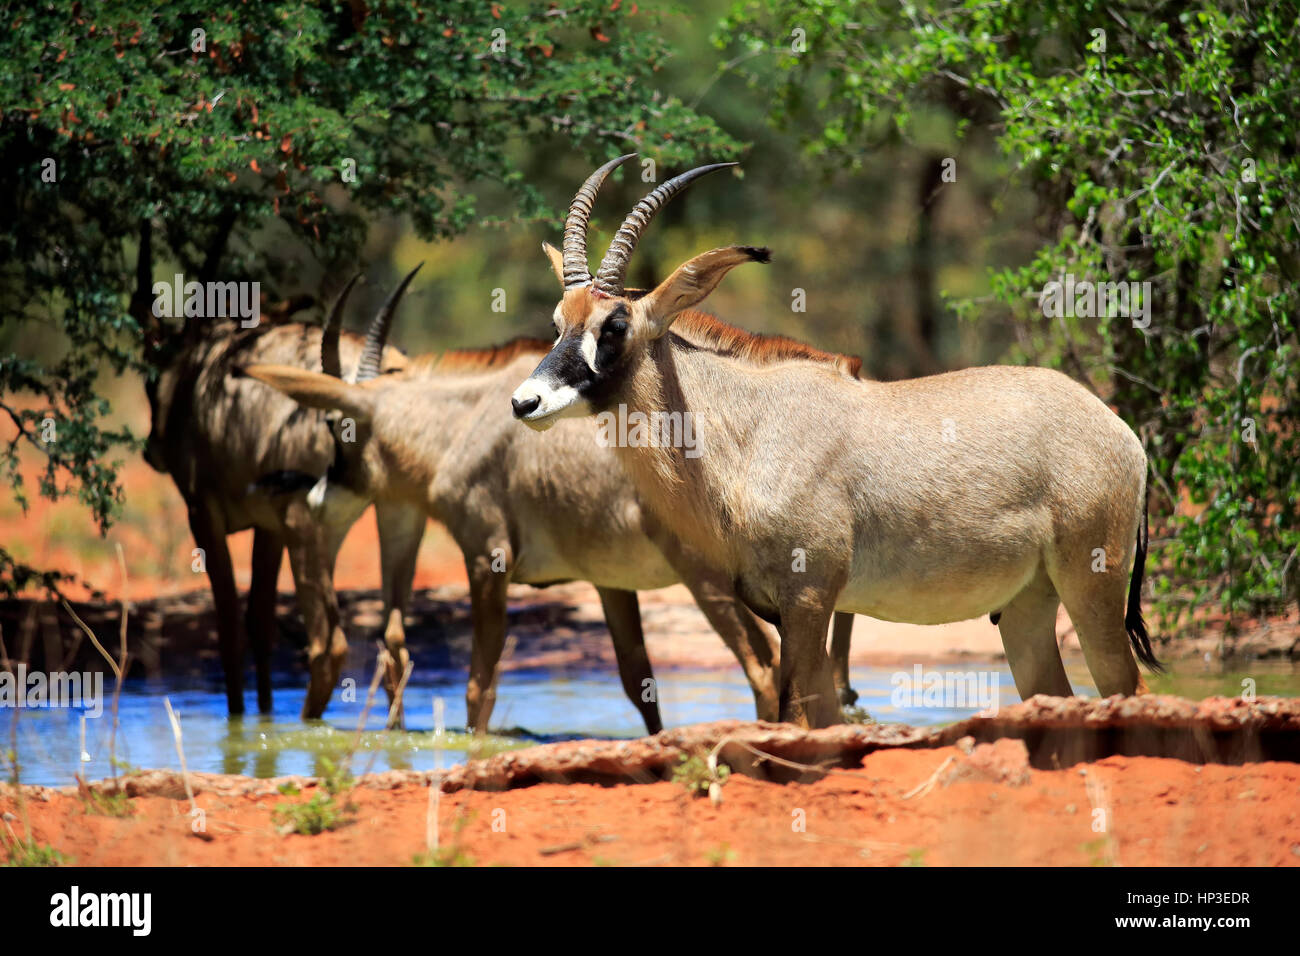 Pferdeantilope, (Hippotragus equinus), adult, Gruppe am Wasserloch, Tswalu Game Reserve, Kalahari, Nordkap, Suedafrika, - Stock Image